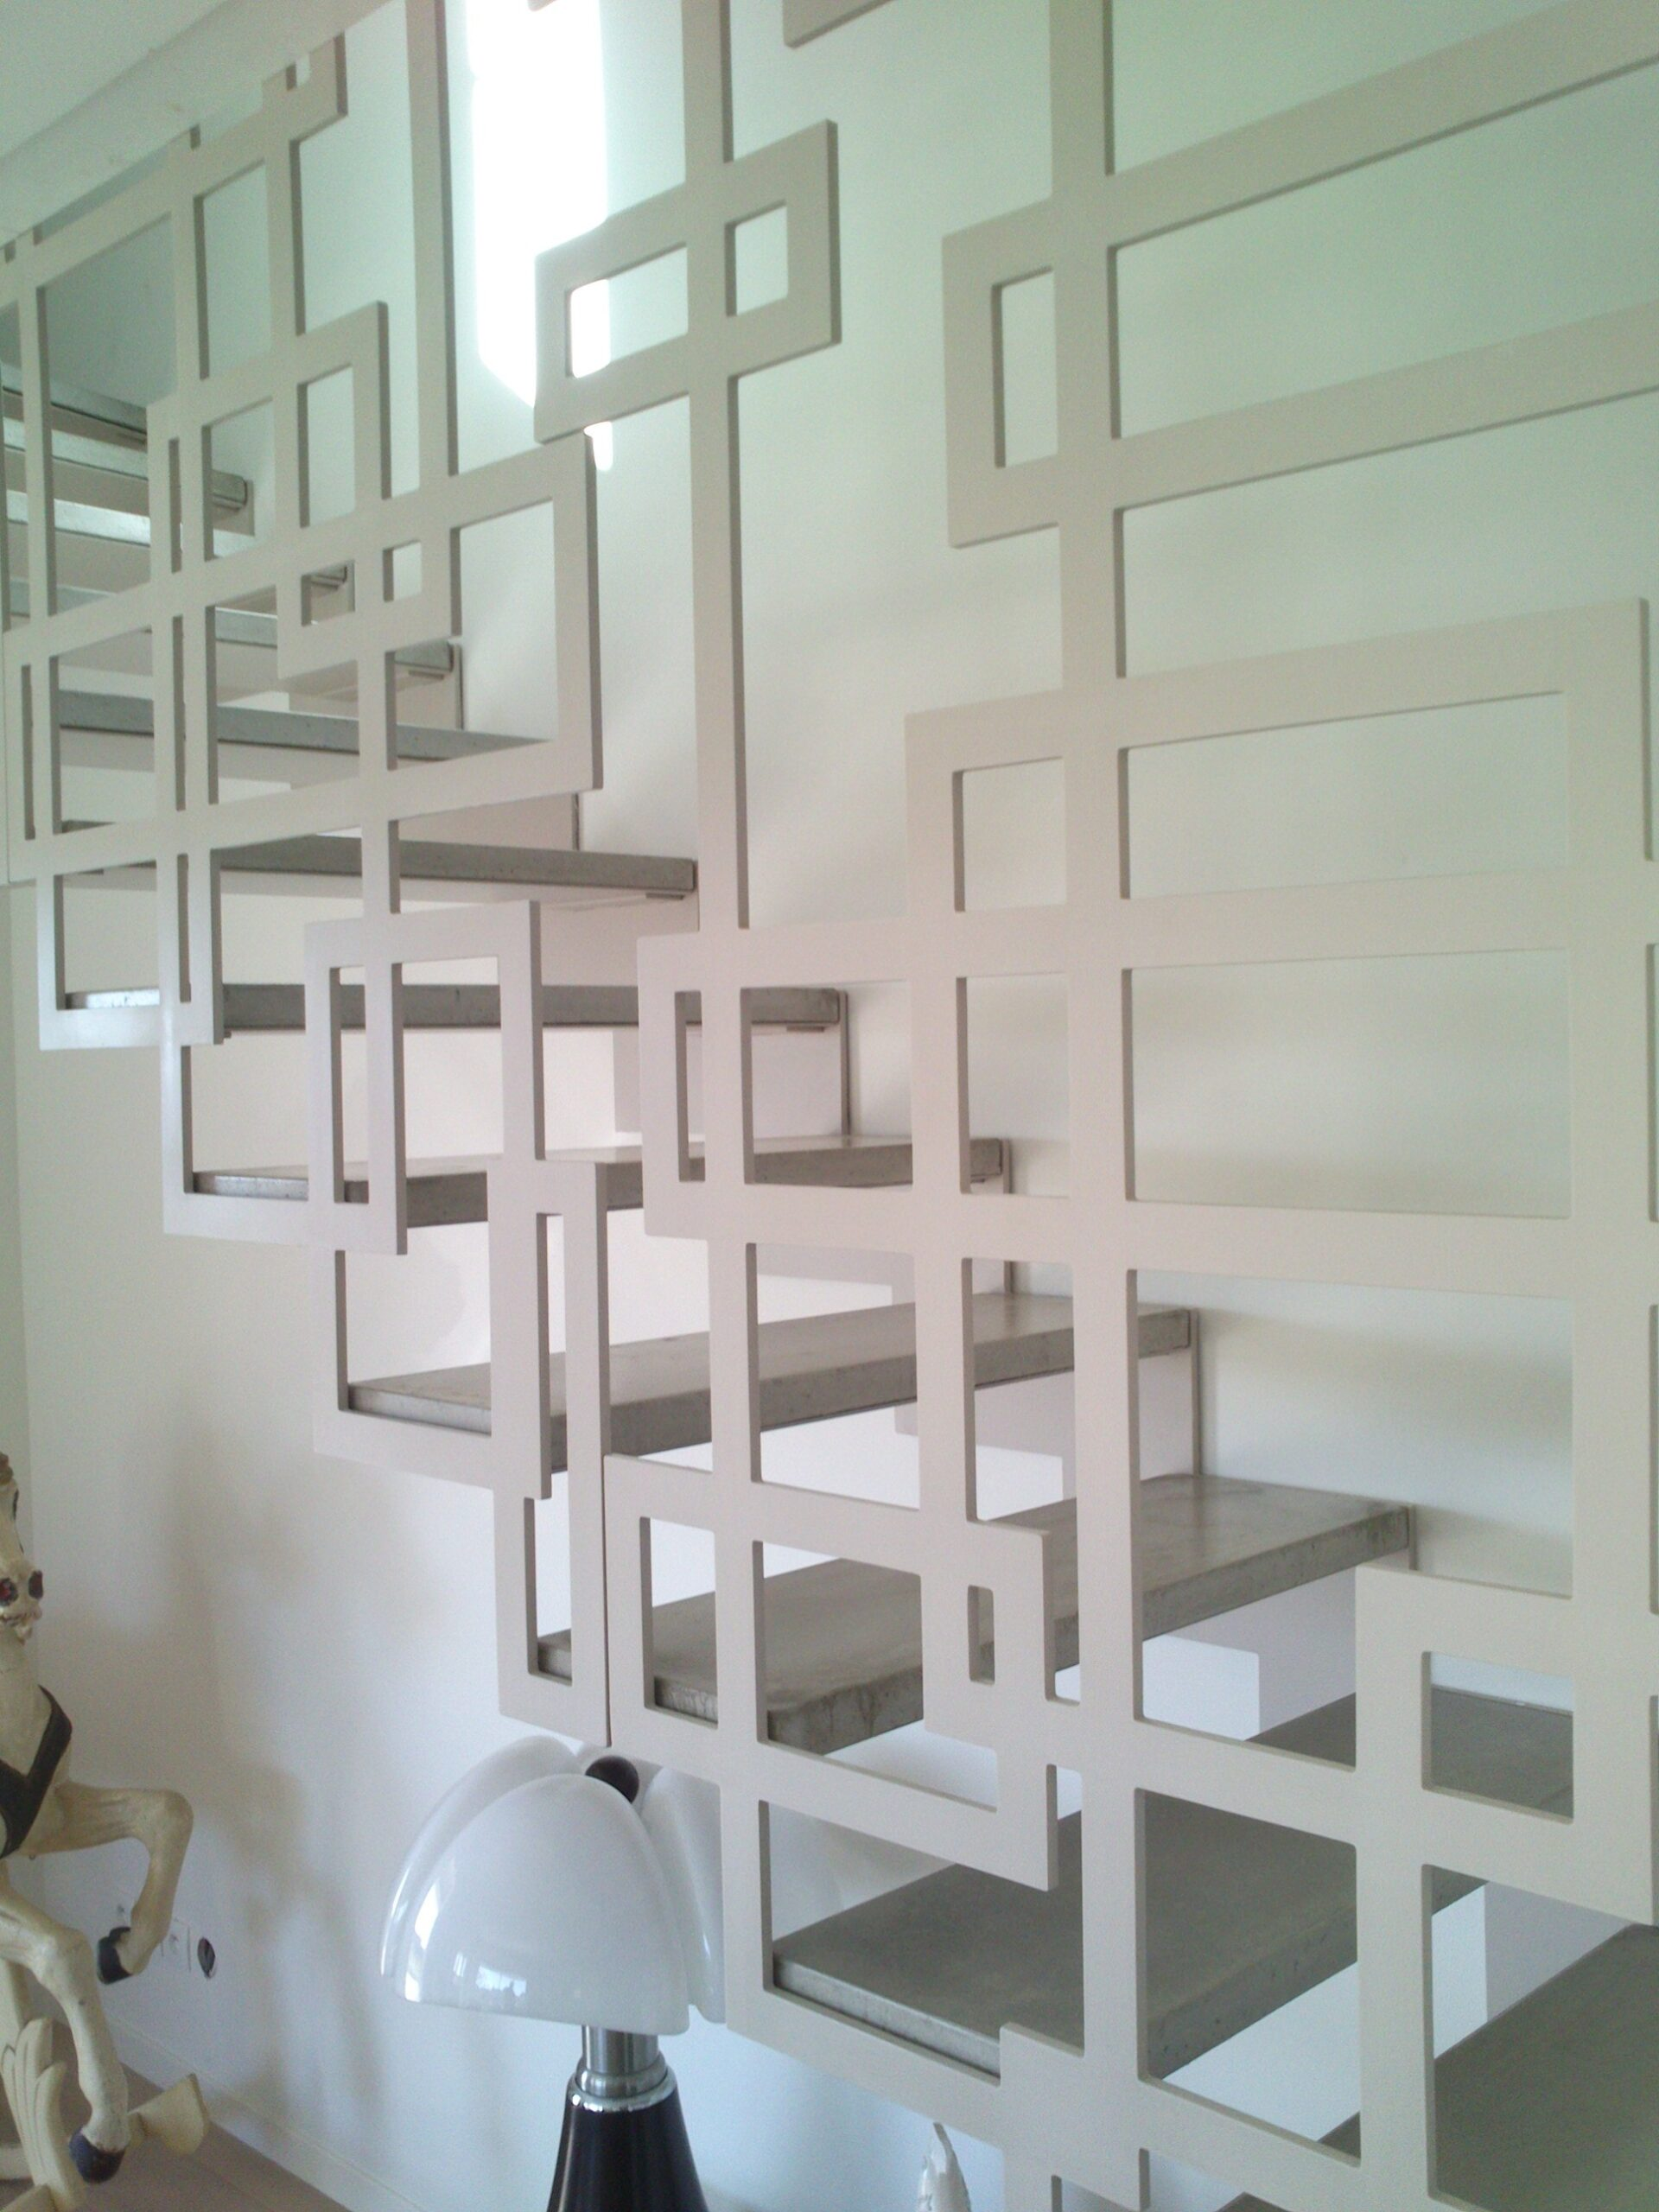 https://www.mon-artisan-ferronnier.com/wp-content/uploads/2021/04/escalier11-2-scaled.jpeg